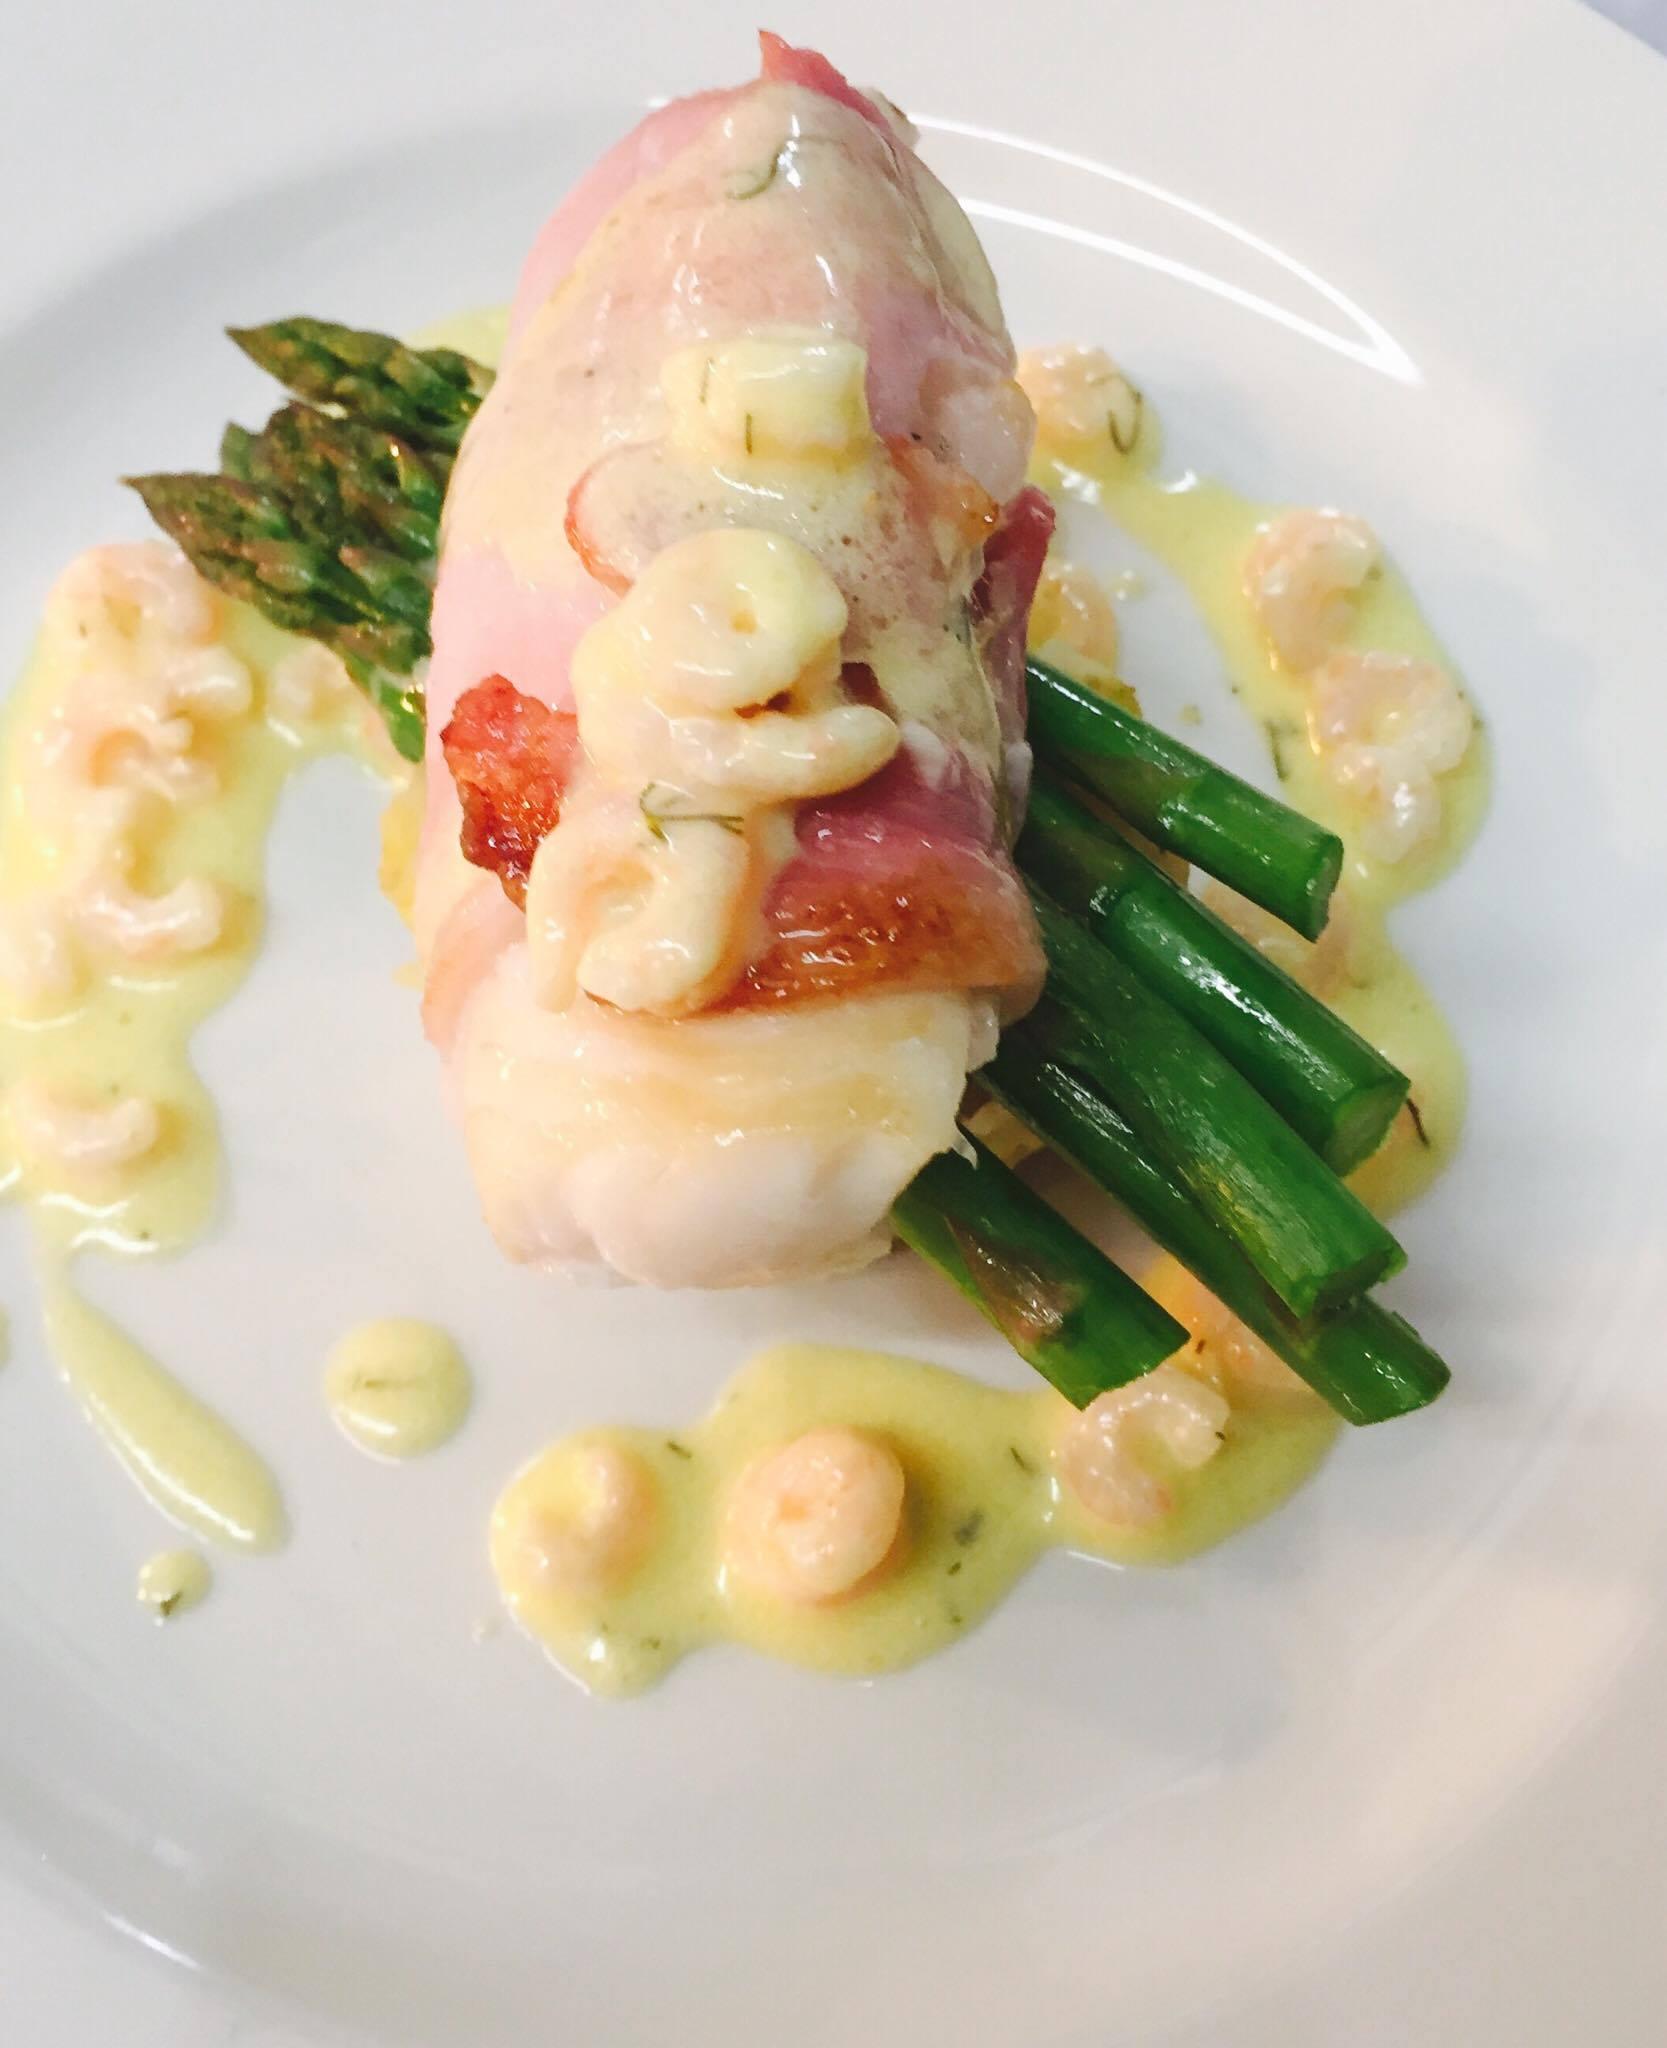 Back wrapped cod lion, crushed new potatoes, British asparagus and prawn, lemon cream.